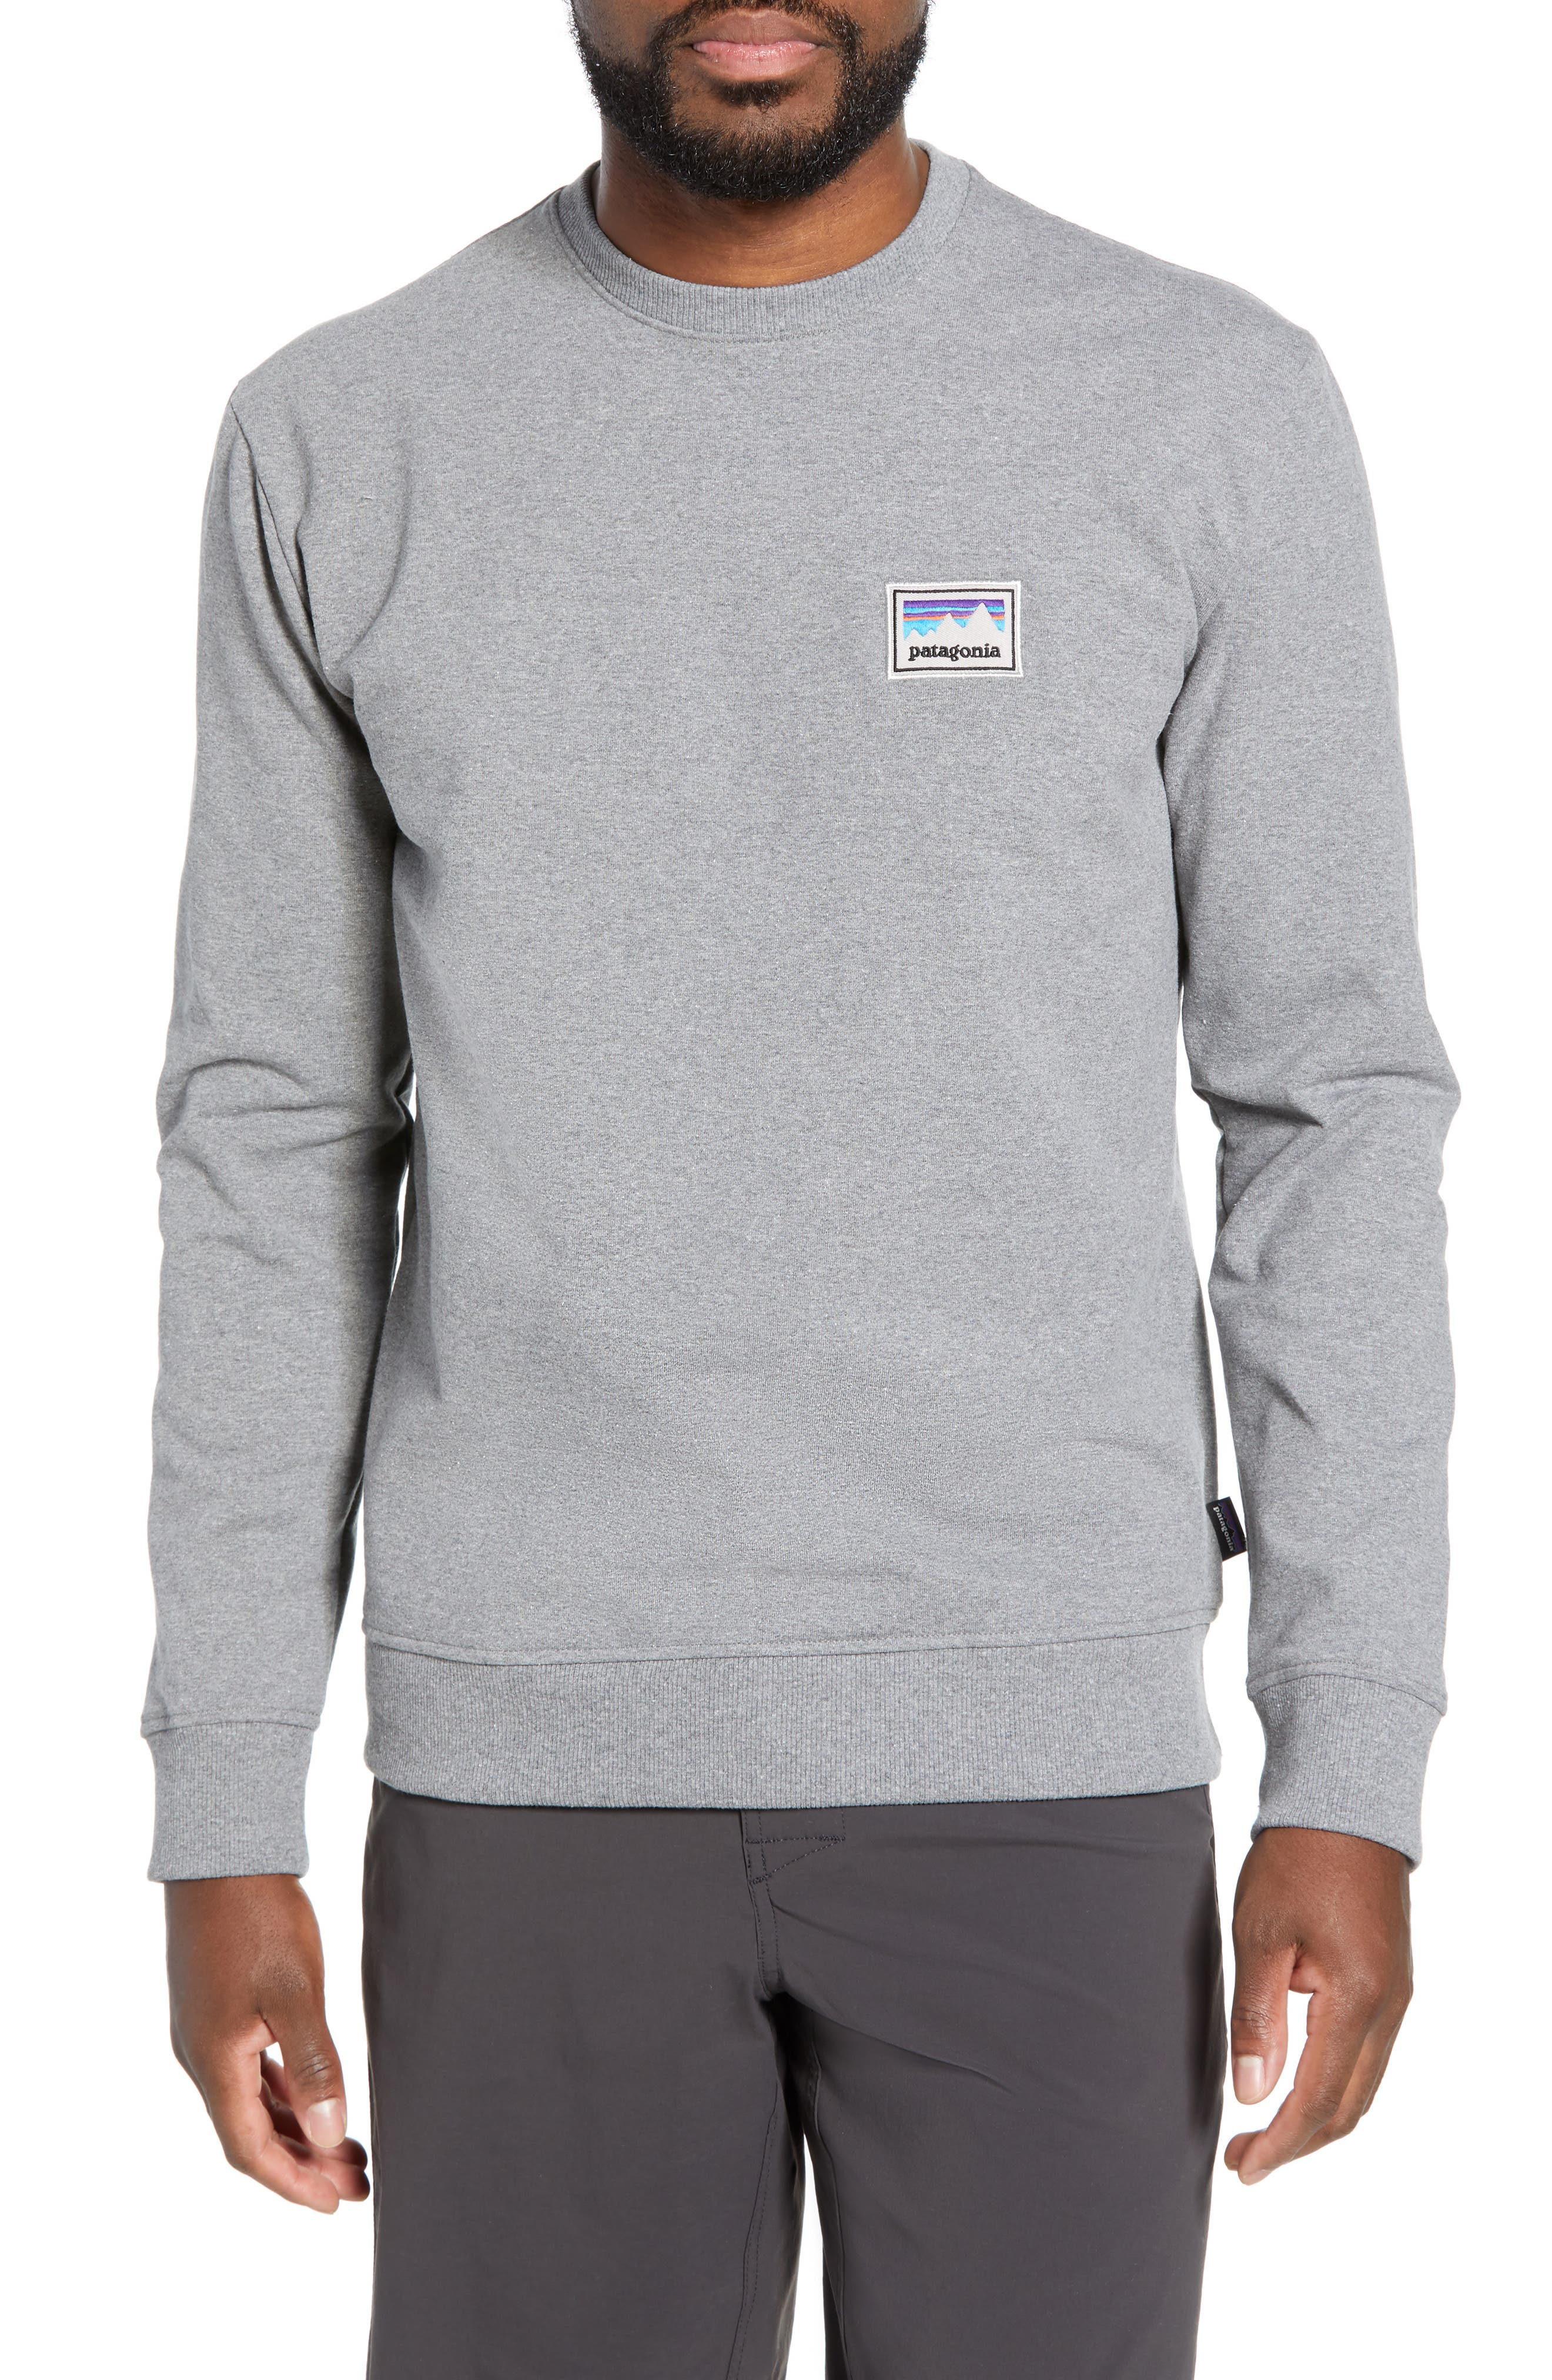 PATAGONIA Shop Sticker Patch Uprisal Crew Sweatshirt, Main, color, GRAVEL HEATHER